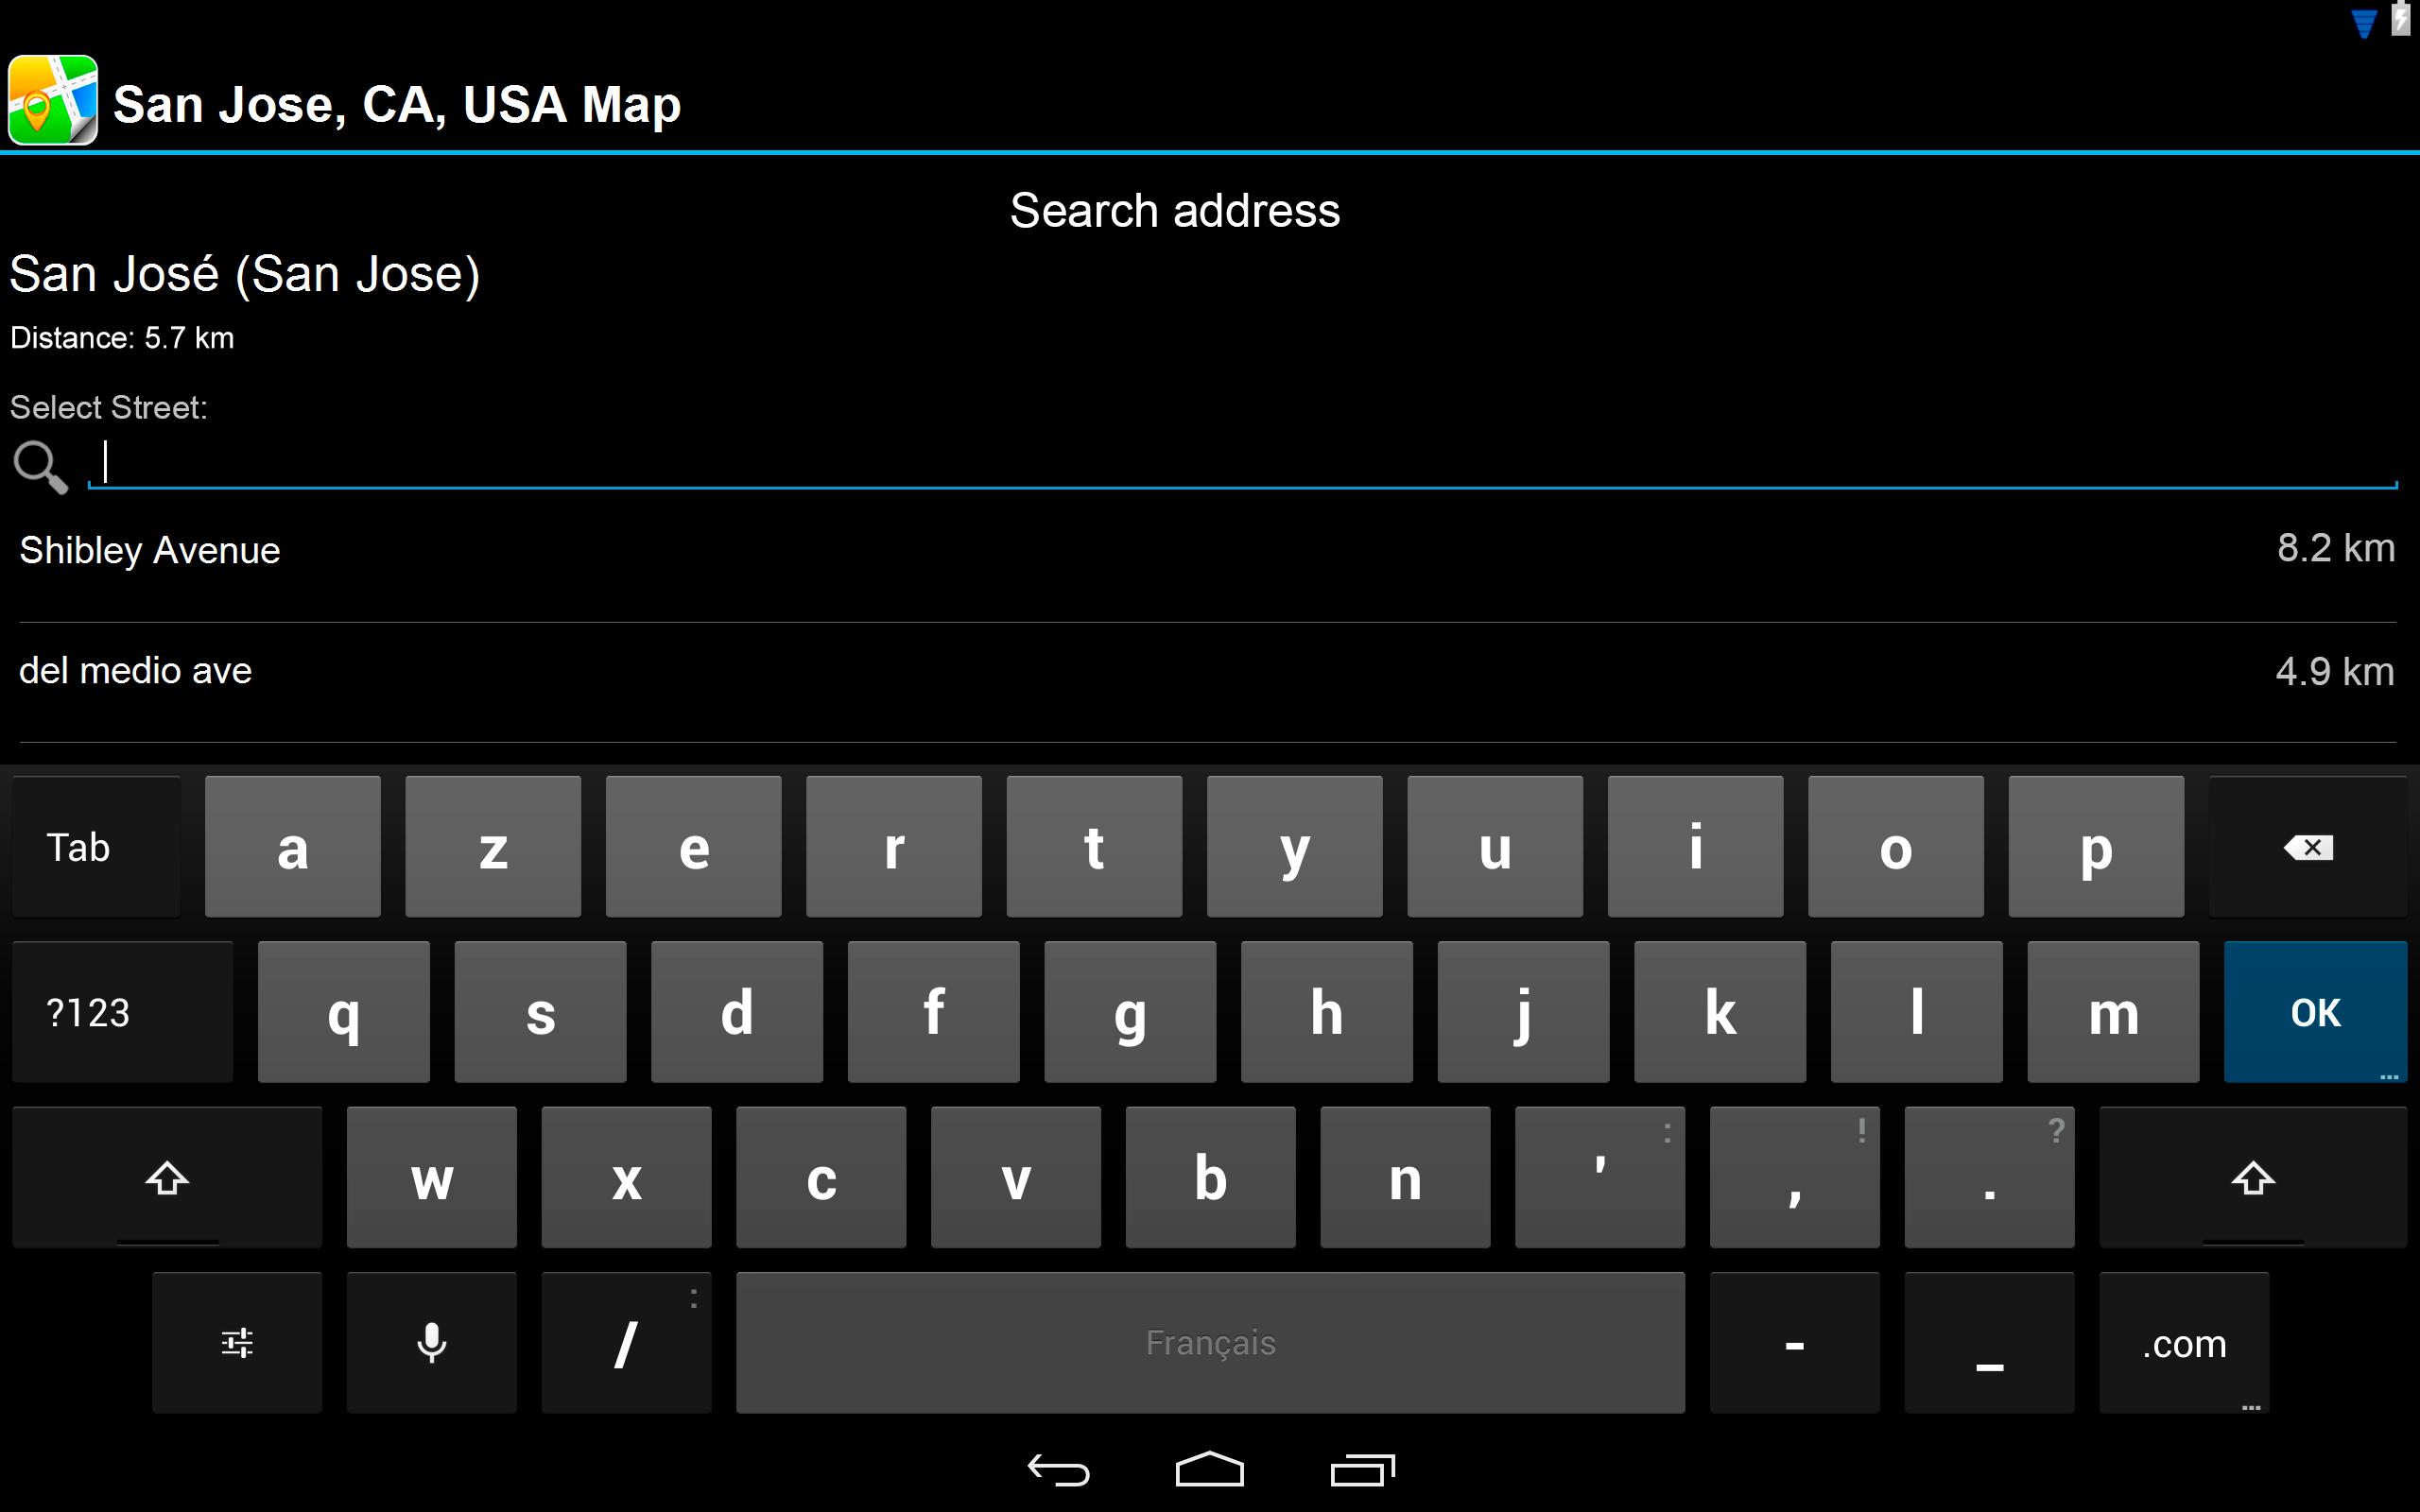 Amazoncom San Jose CA USA Offline Map PLACE STARS Appstore - Map of usa showing san jose